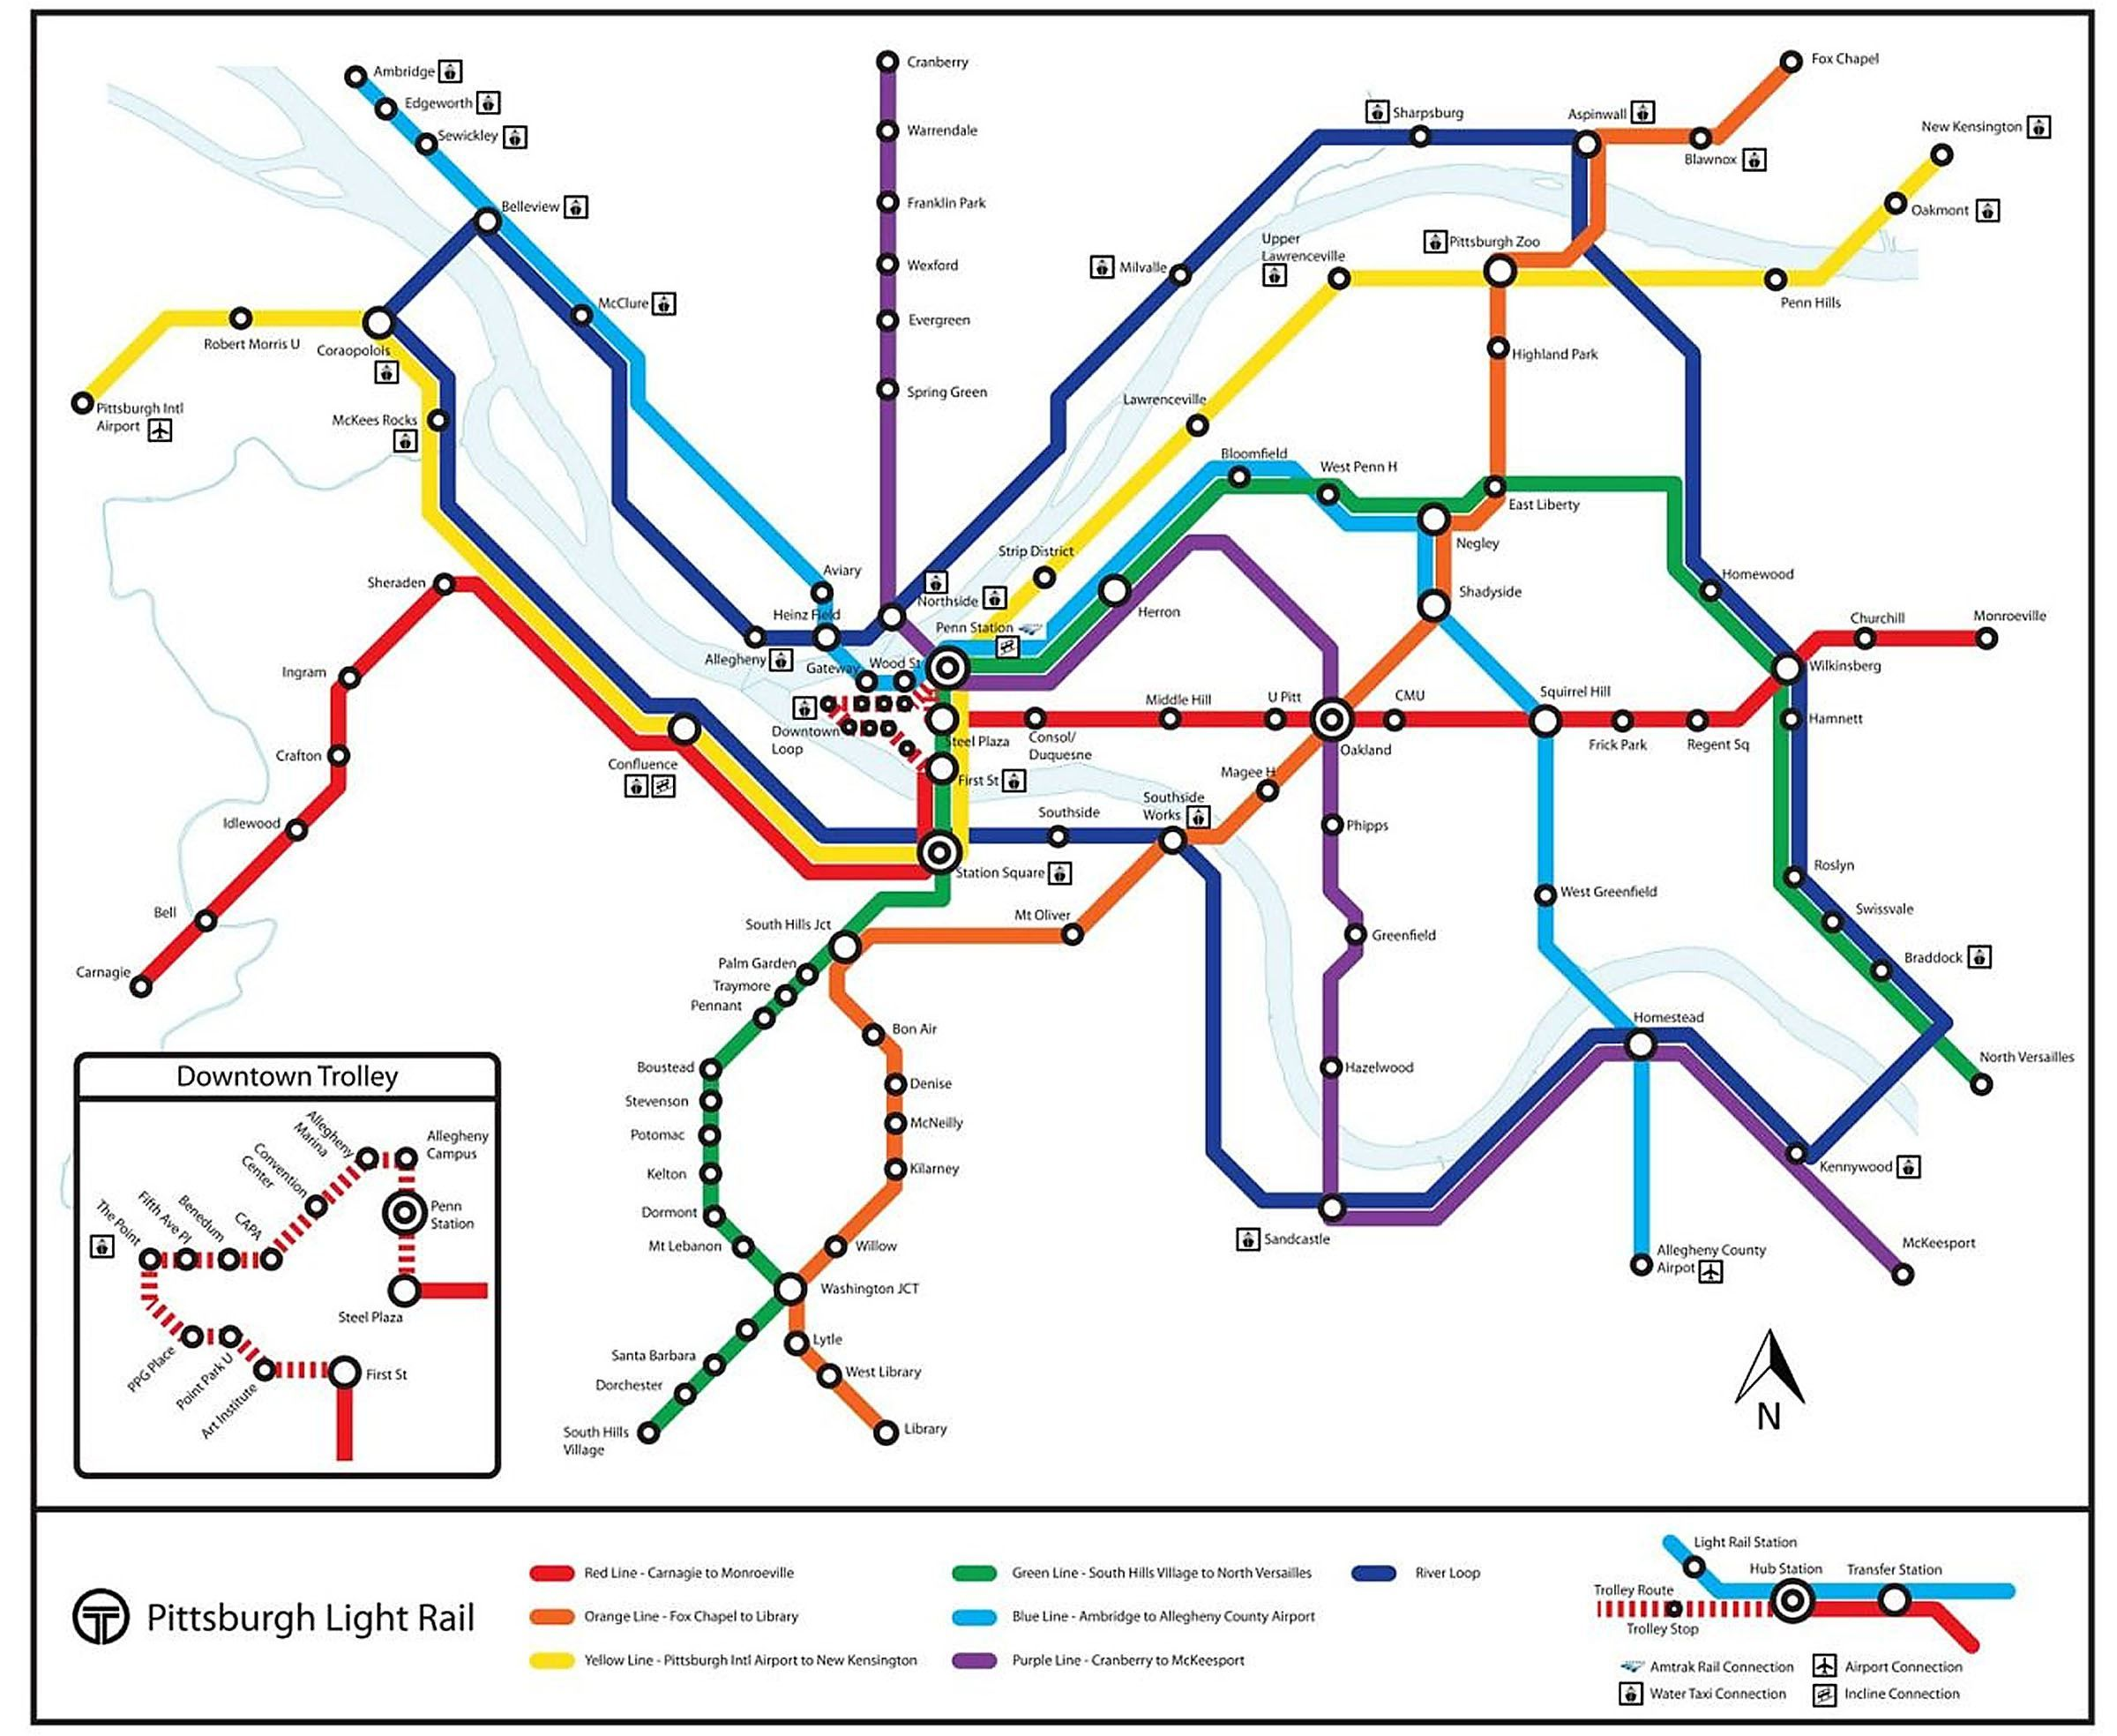 Pittsburgh T Subway Map.Walkabout0418 Subway Map Subway Map Designed By Ben Samson P